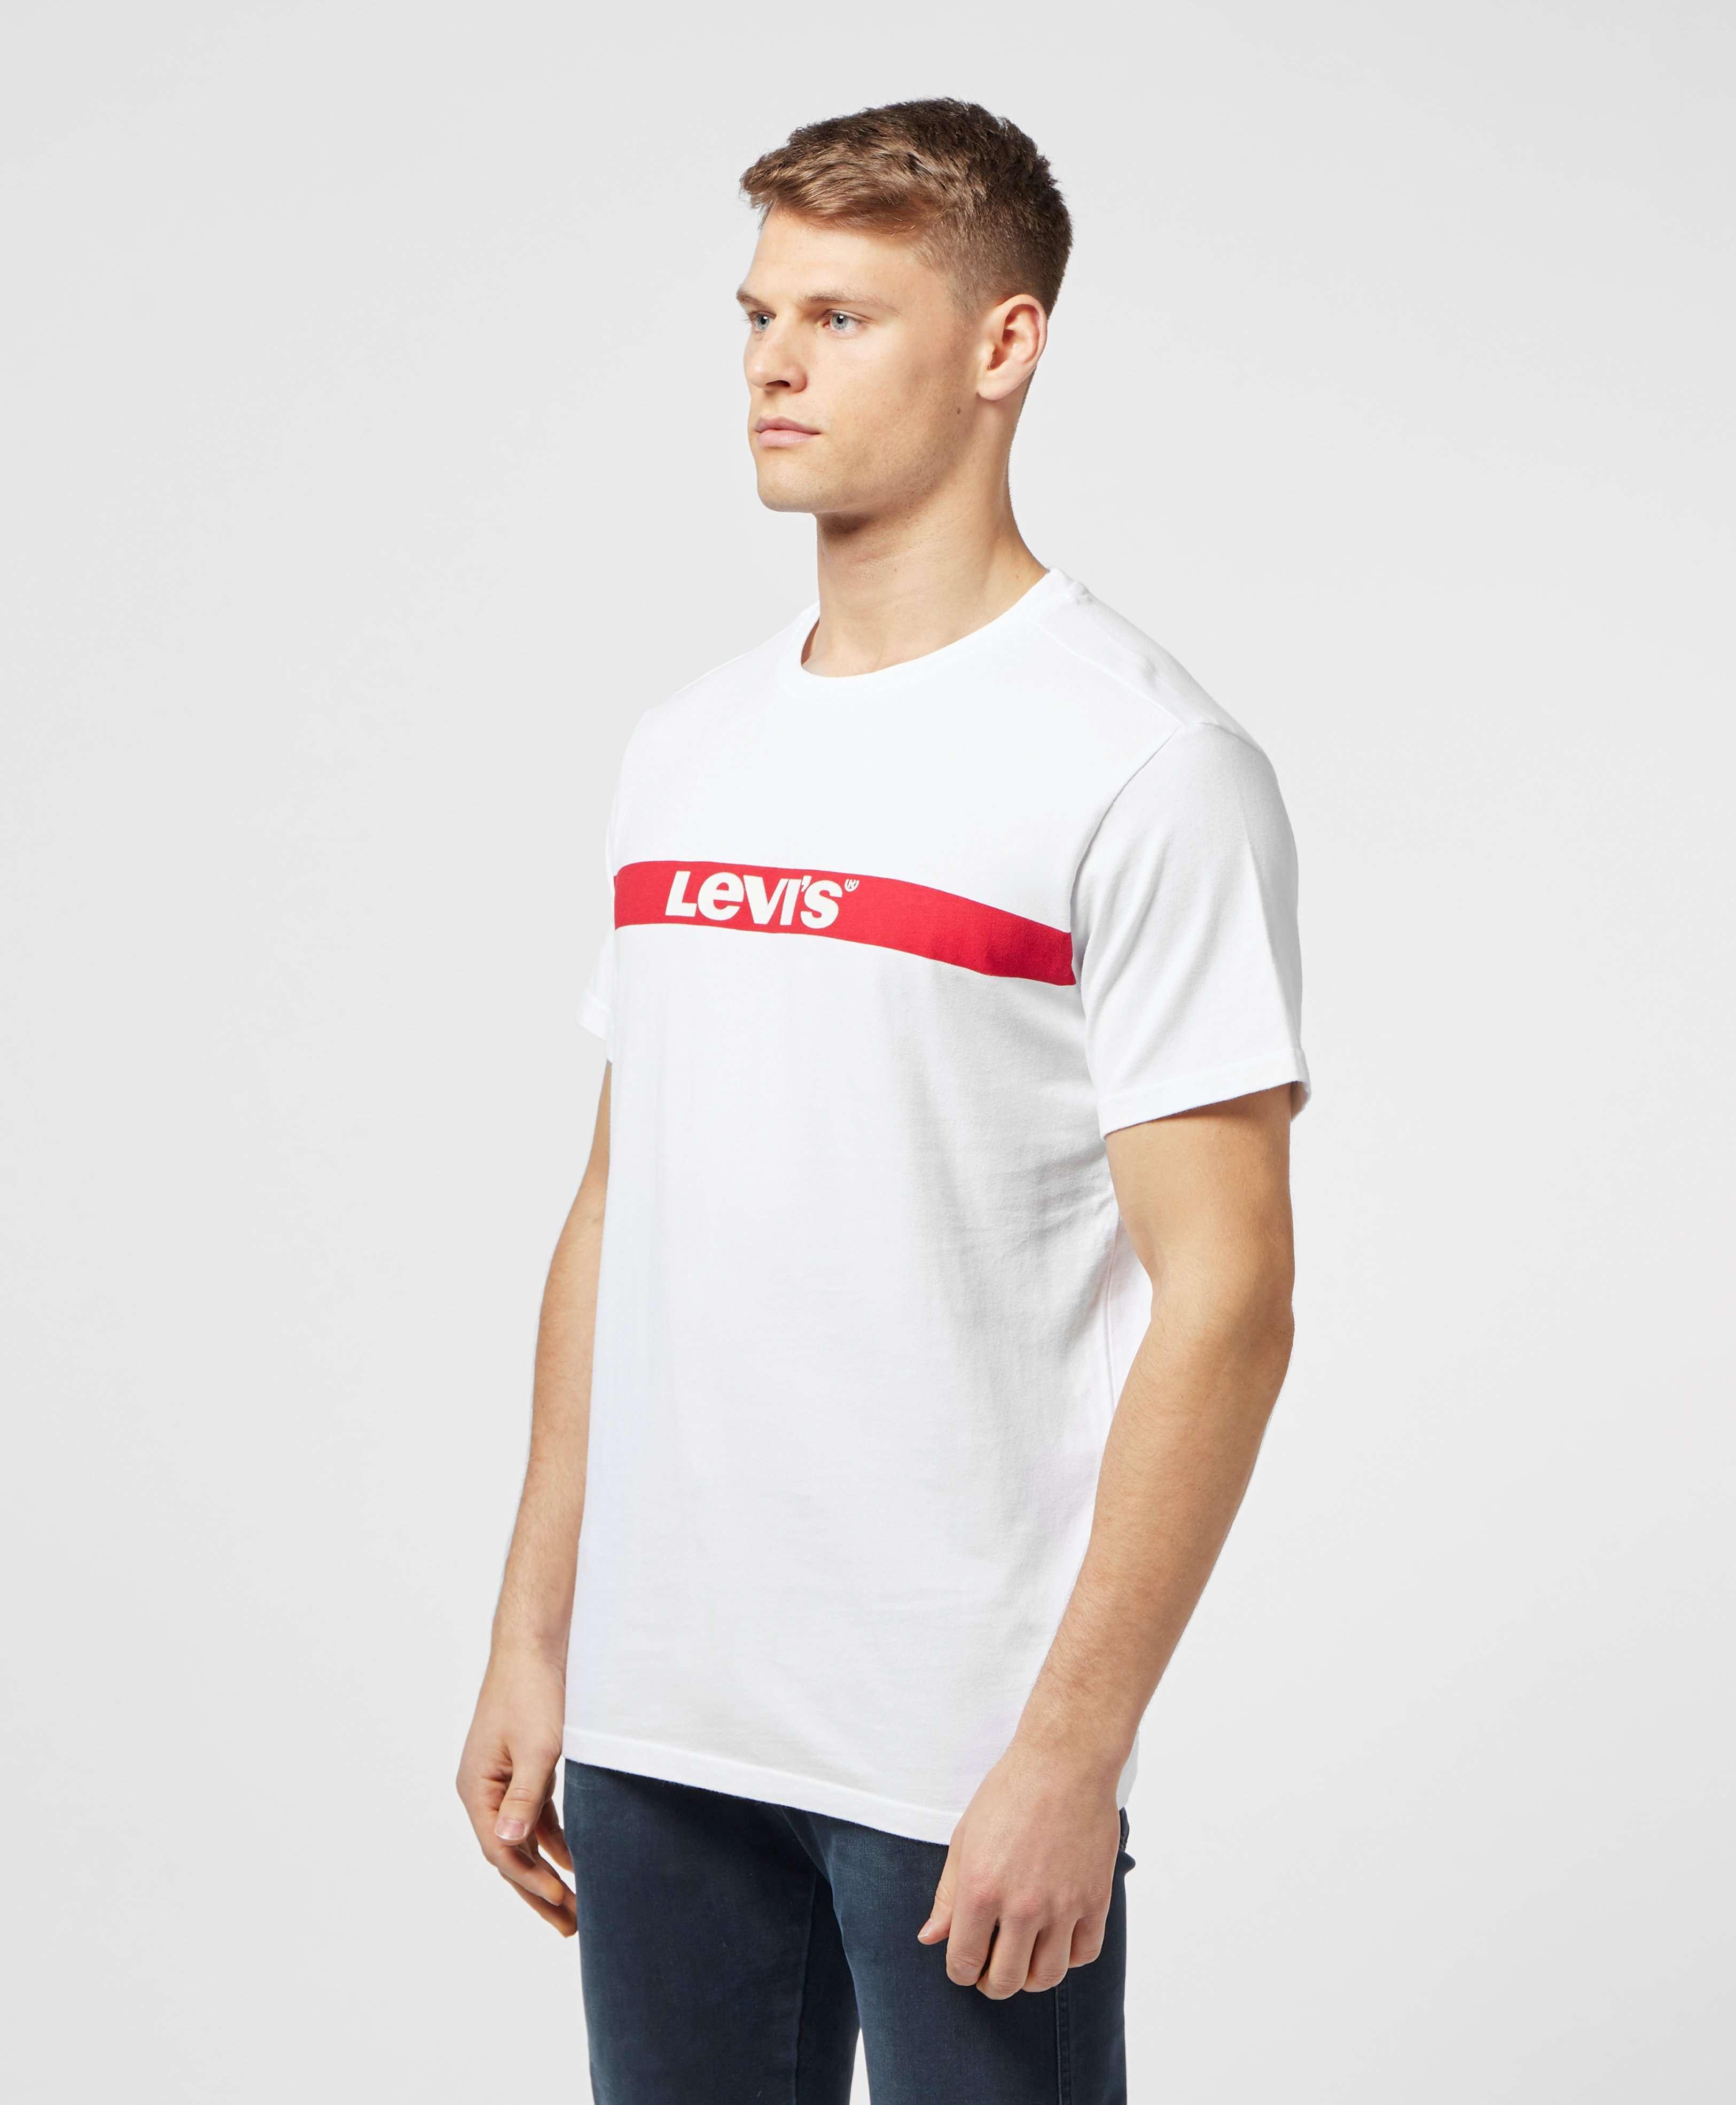 Levis Oversized Bar Logo Short Sleeve T-Shirt